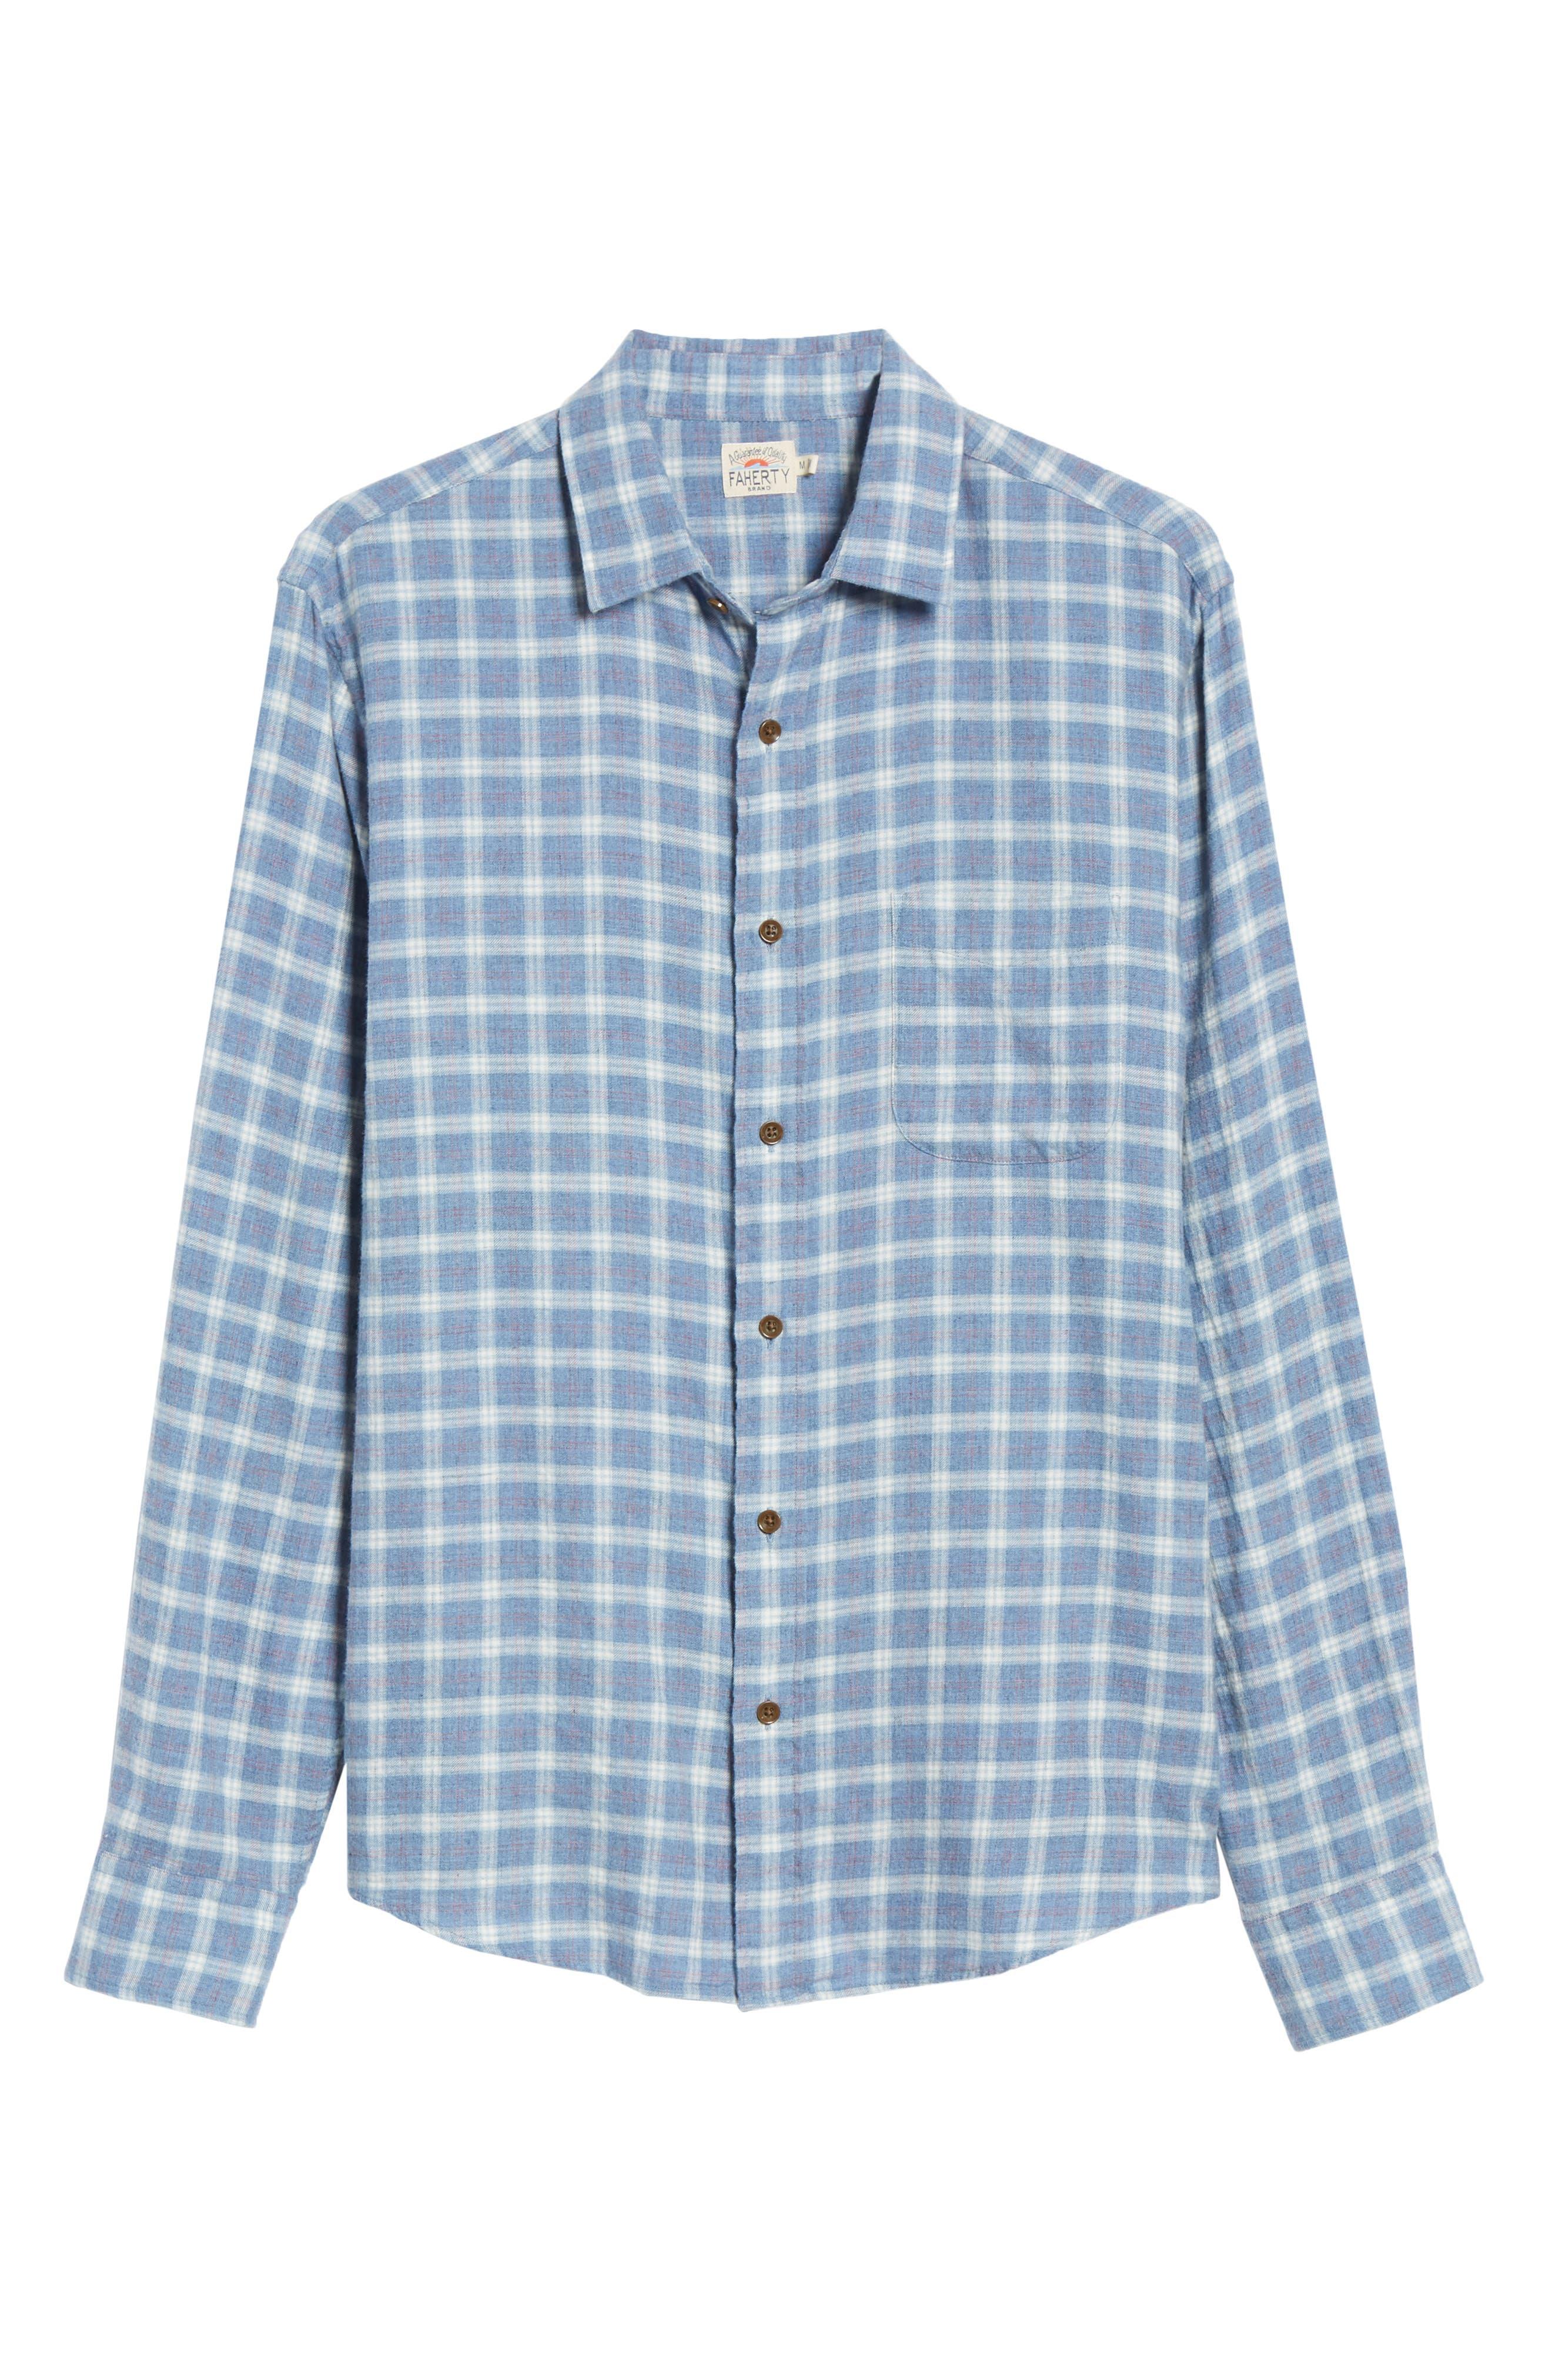 Ventura Oxford Sport Shirt,                             Alternate thumbnail 5, color,                             HEATHER BLUE CHECK